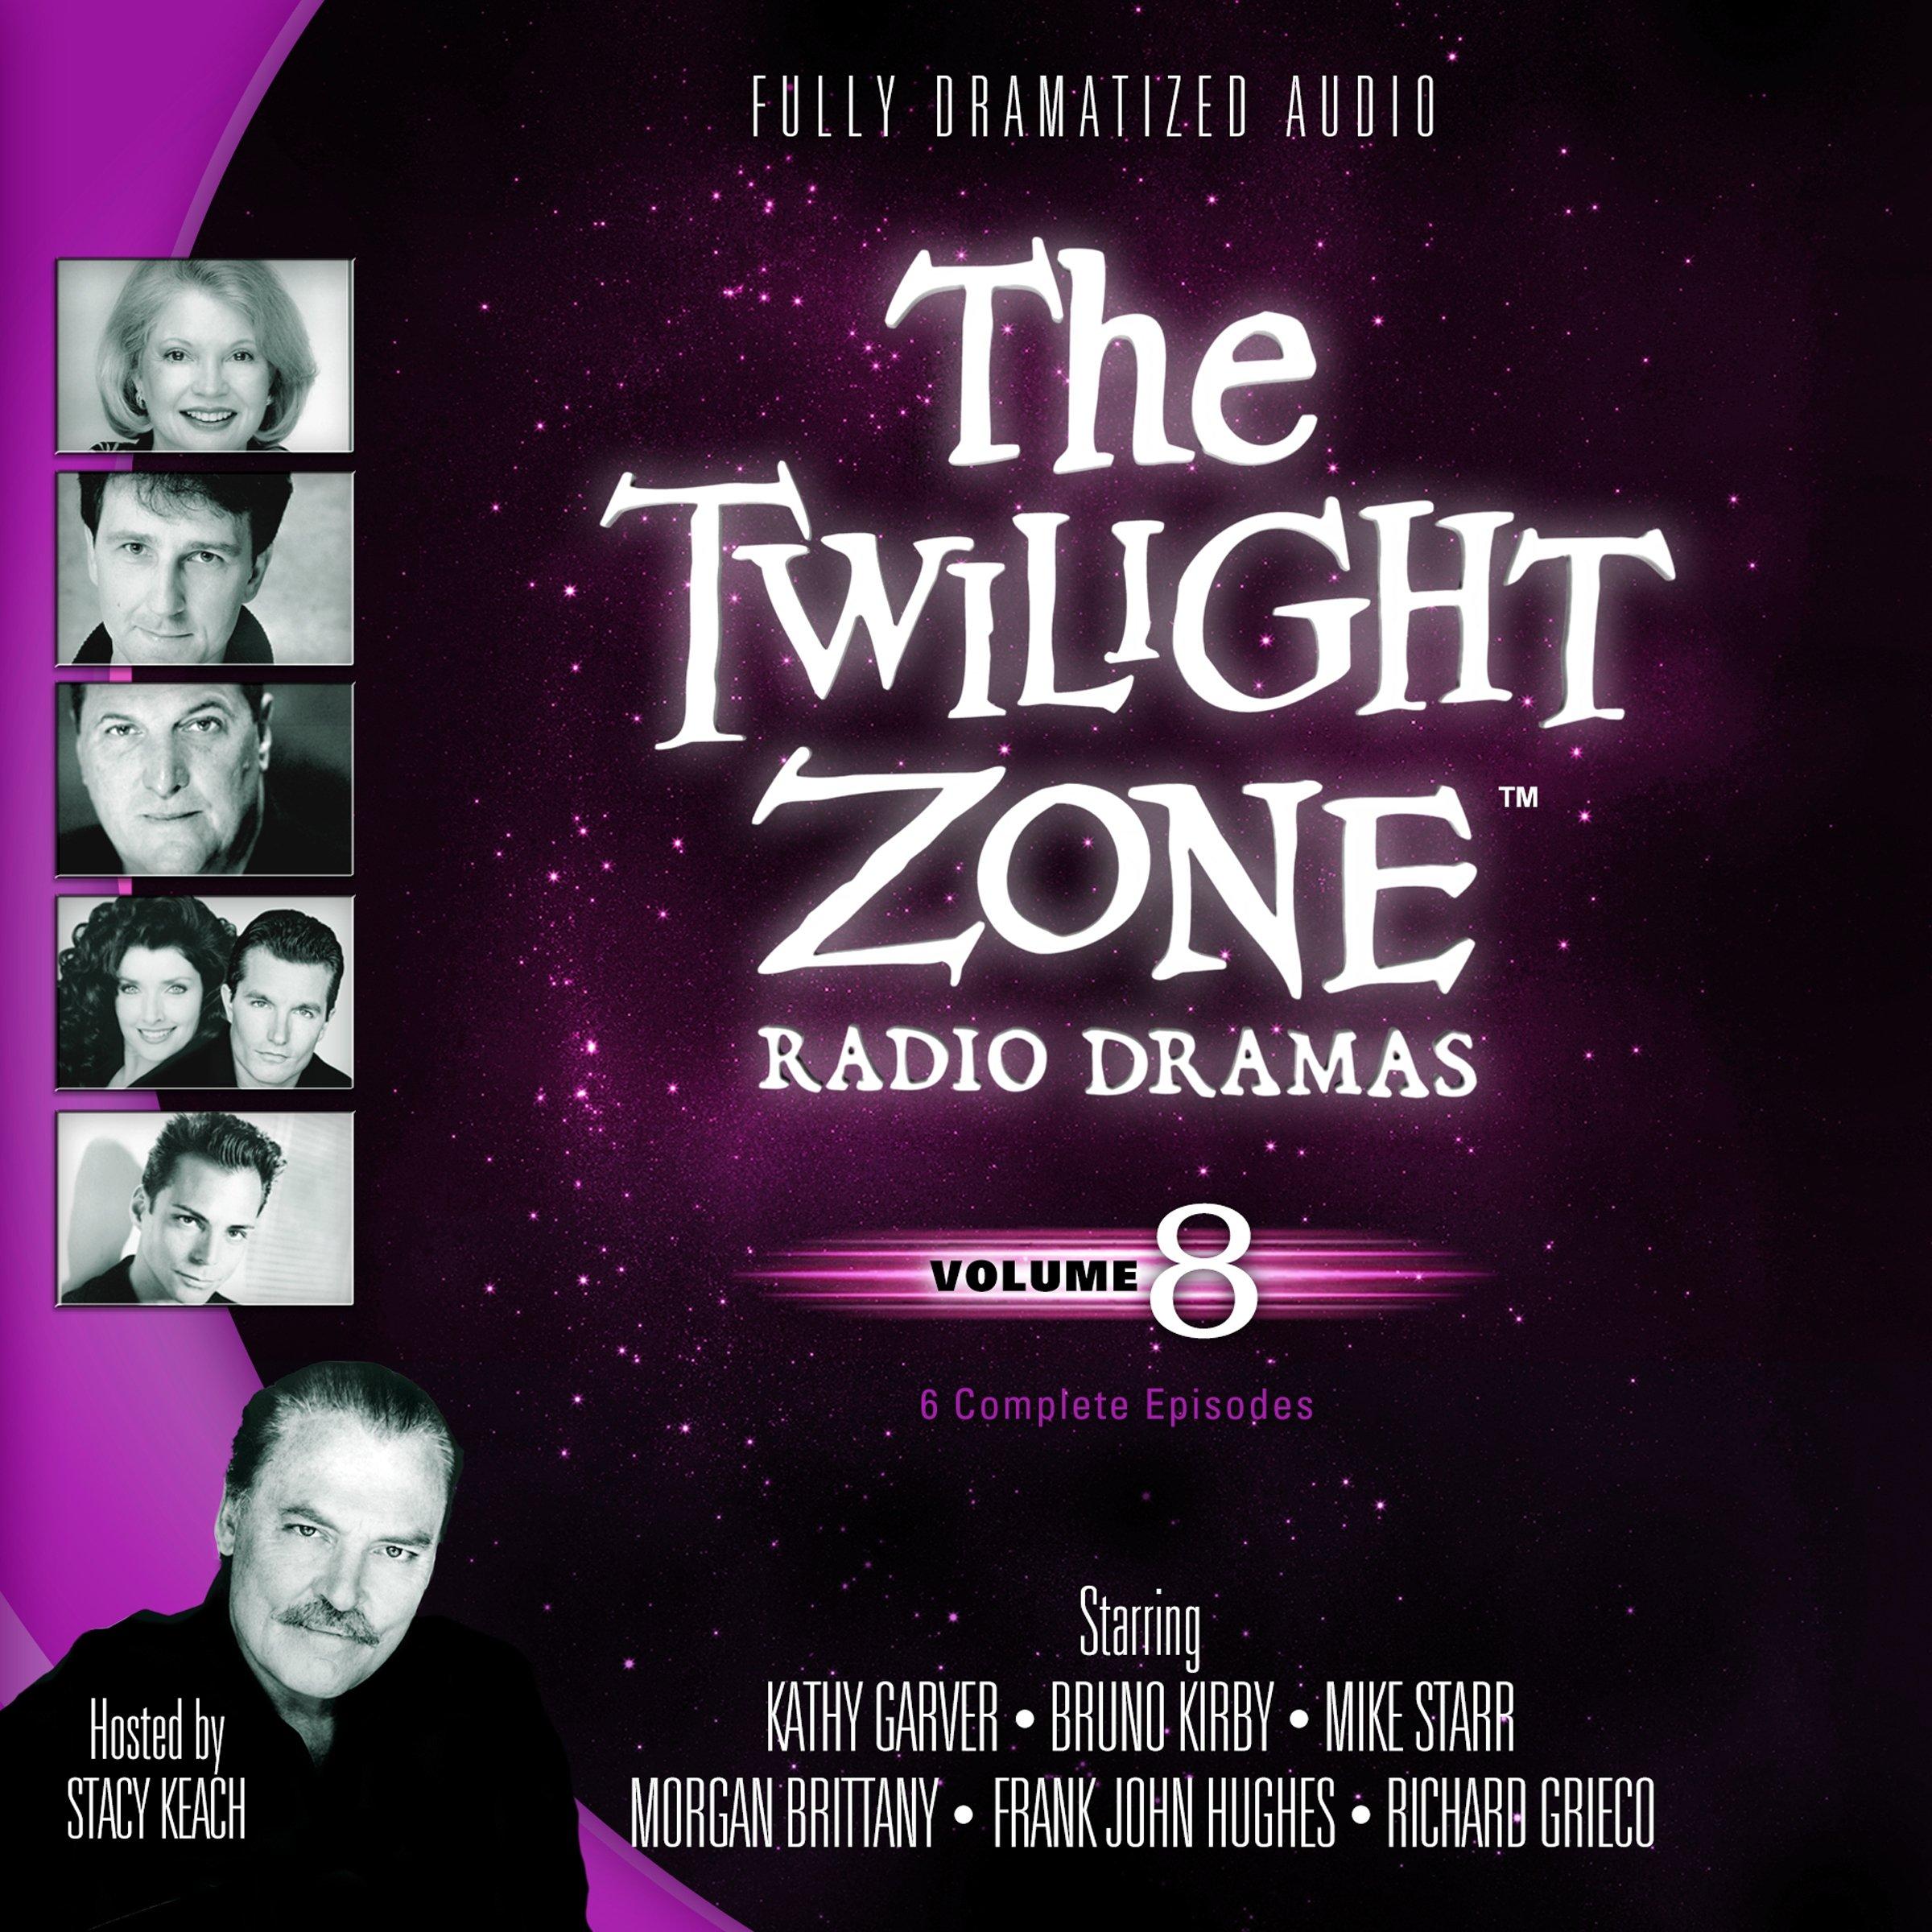 twilight zone radio dramas vol8